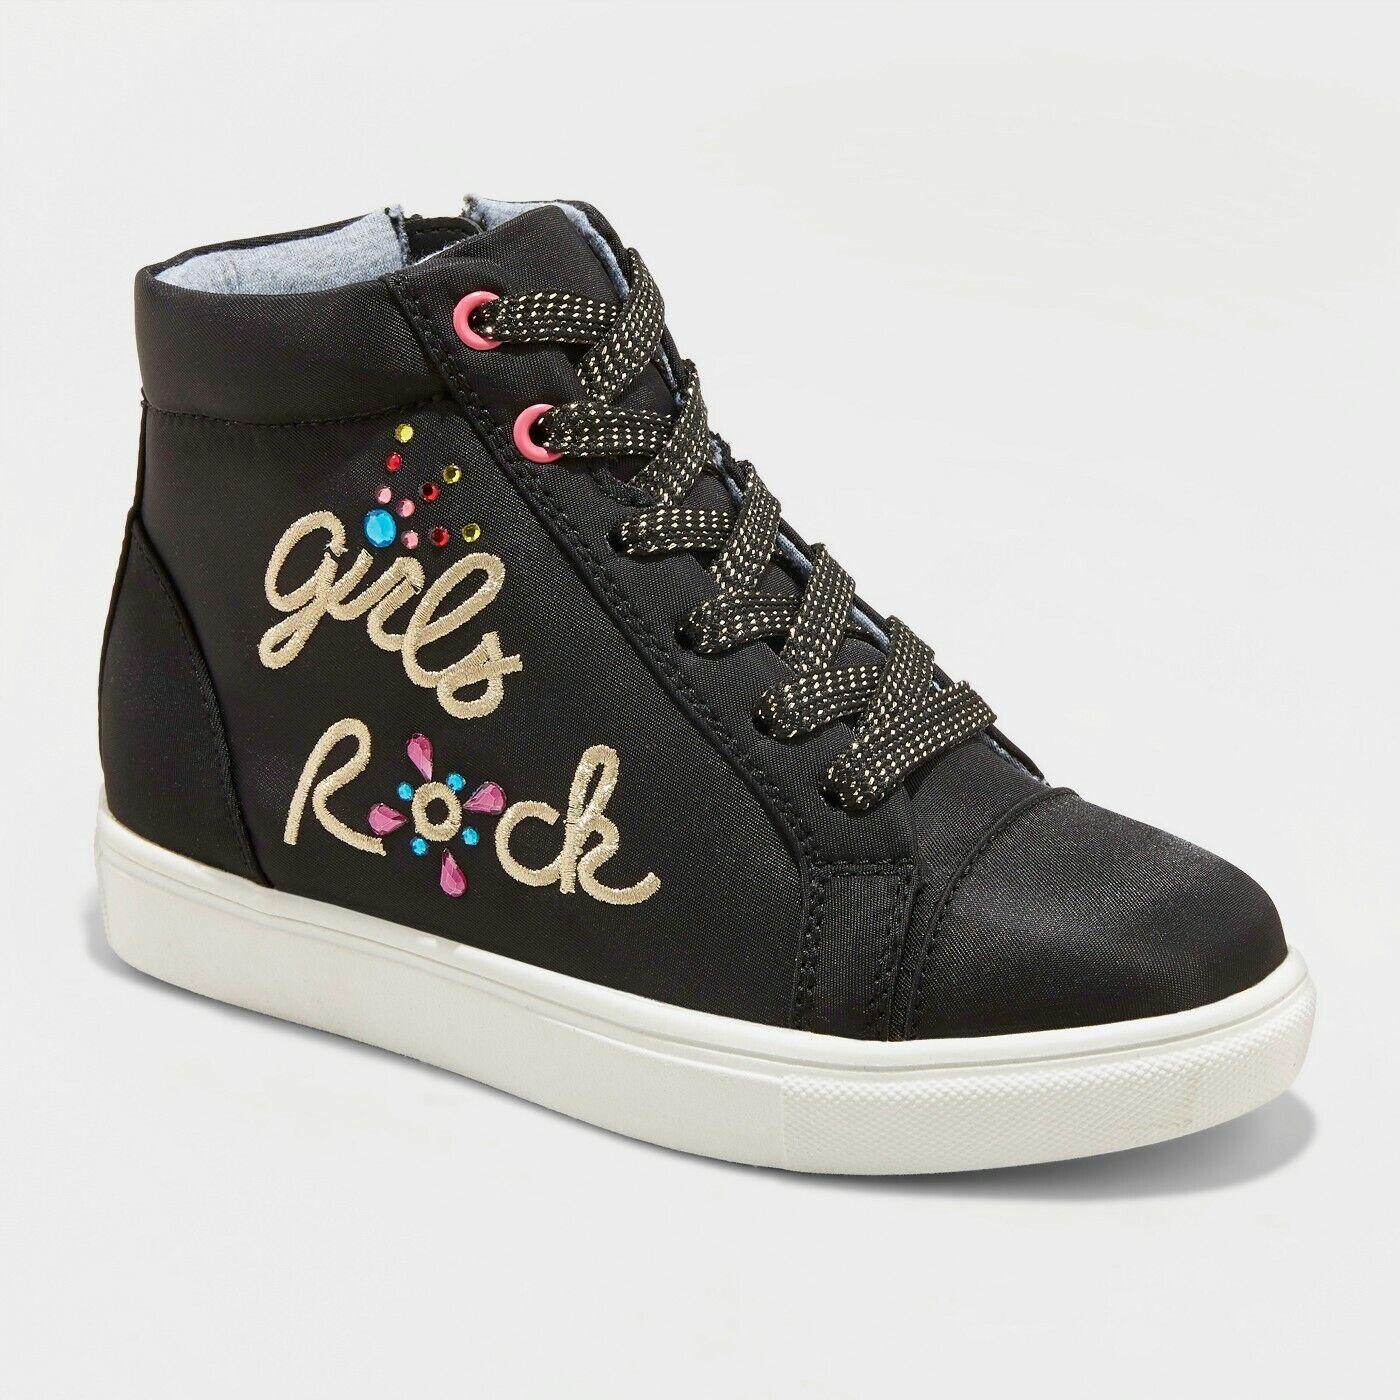 NWT Girls' Stevies Rock Camaro High Top